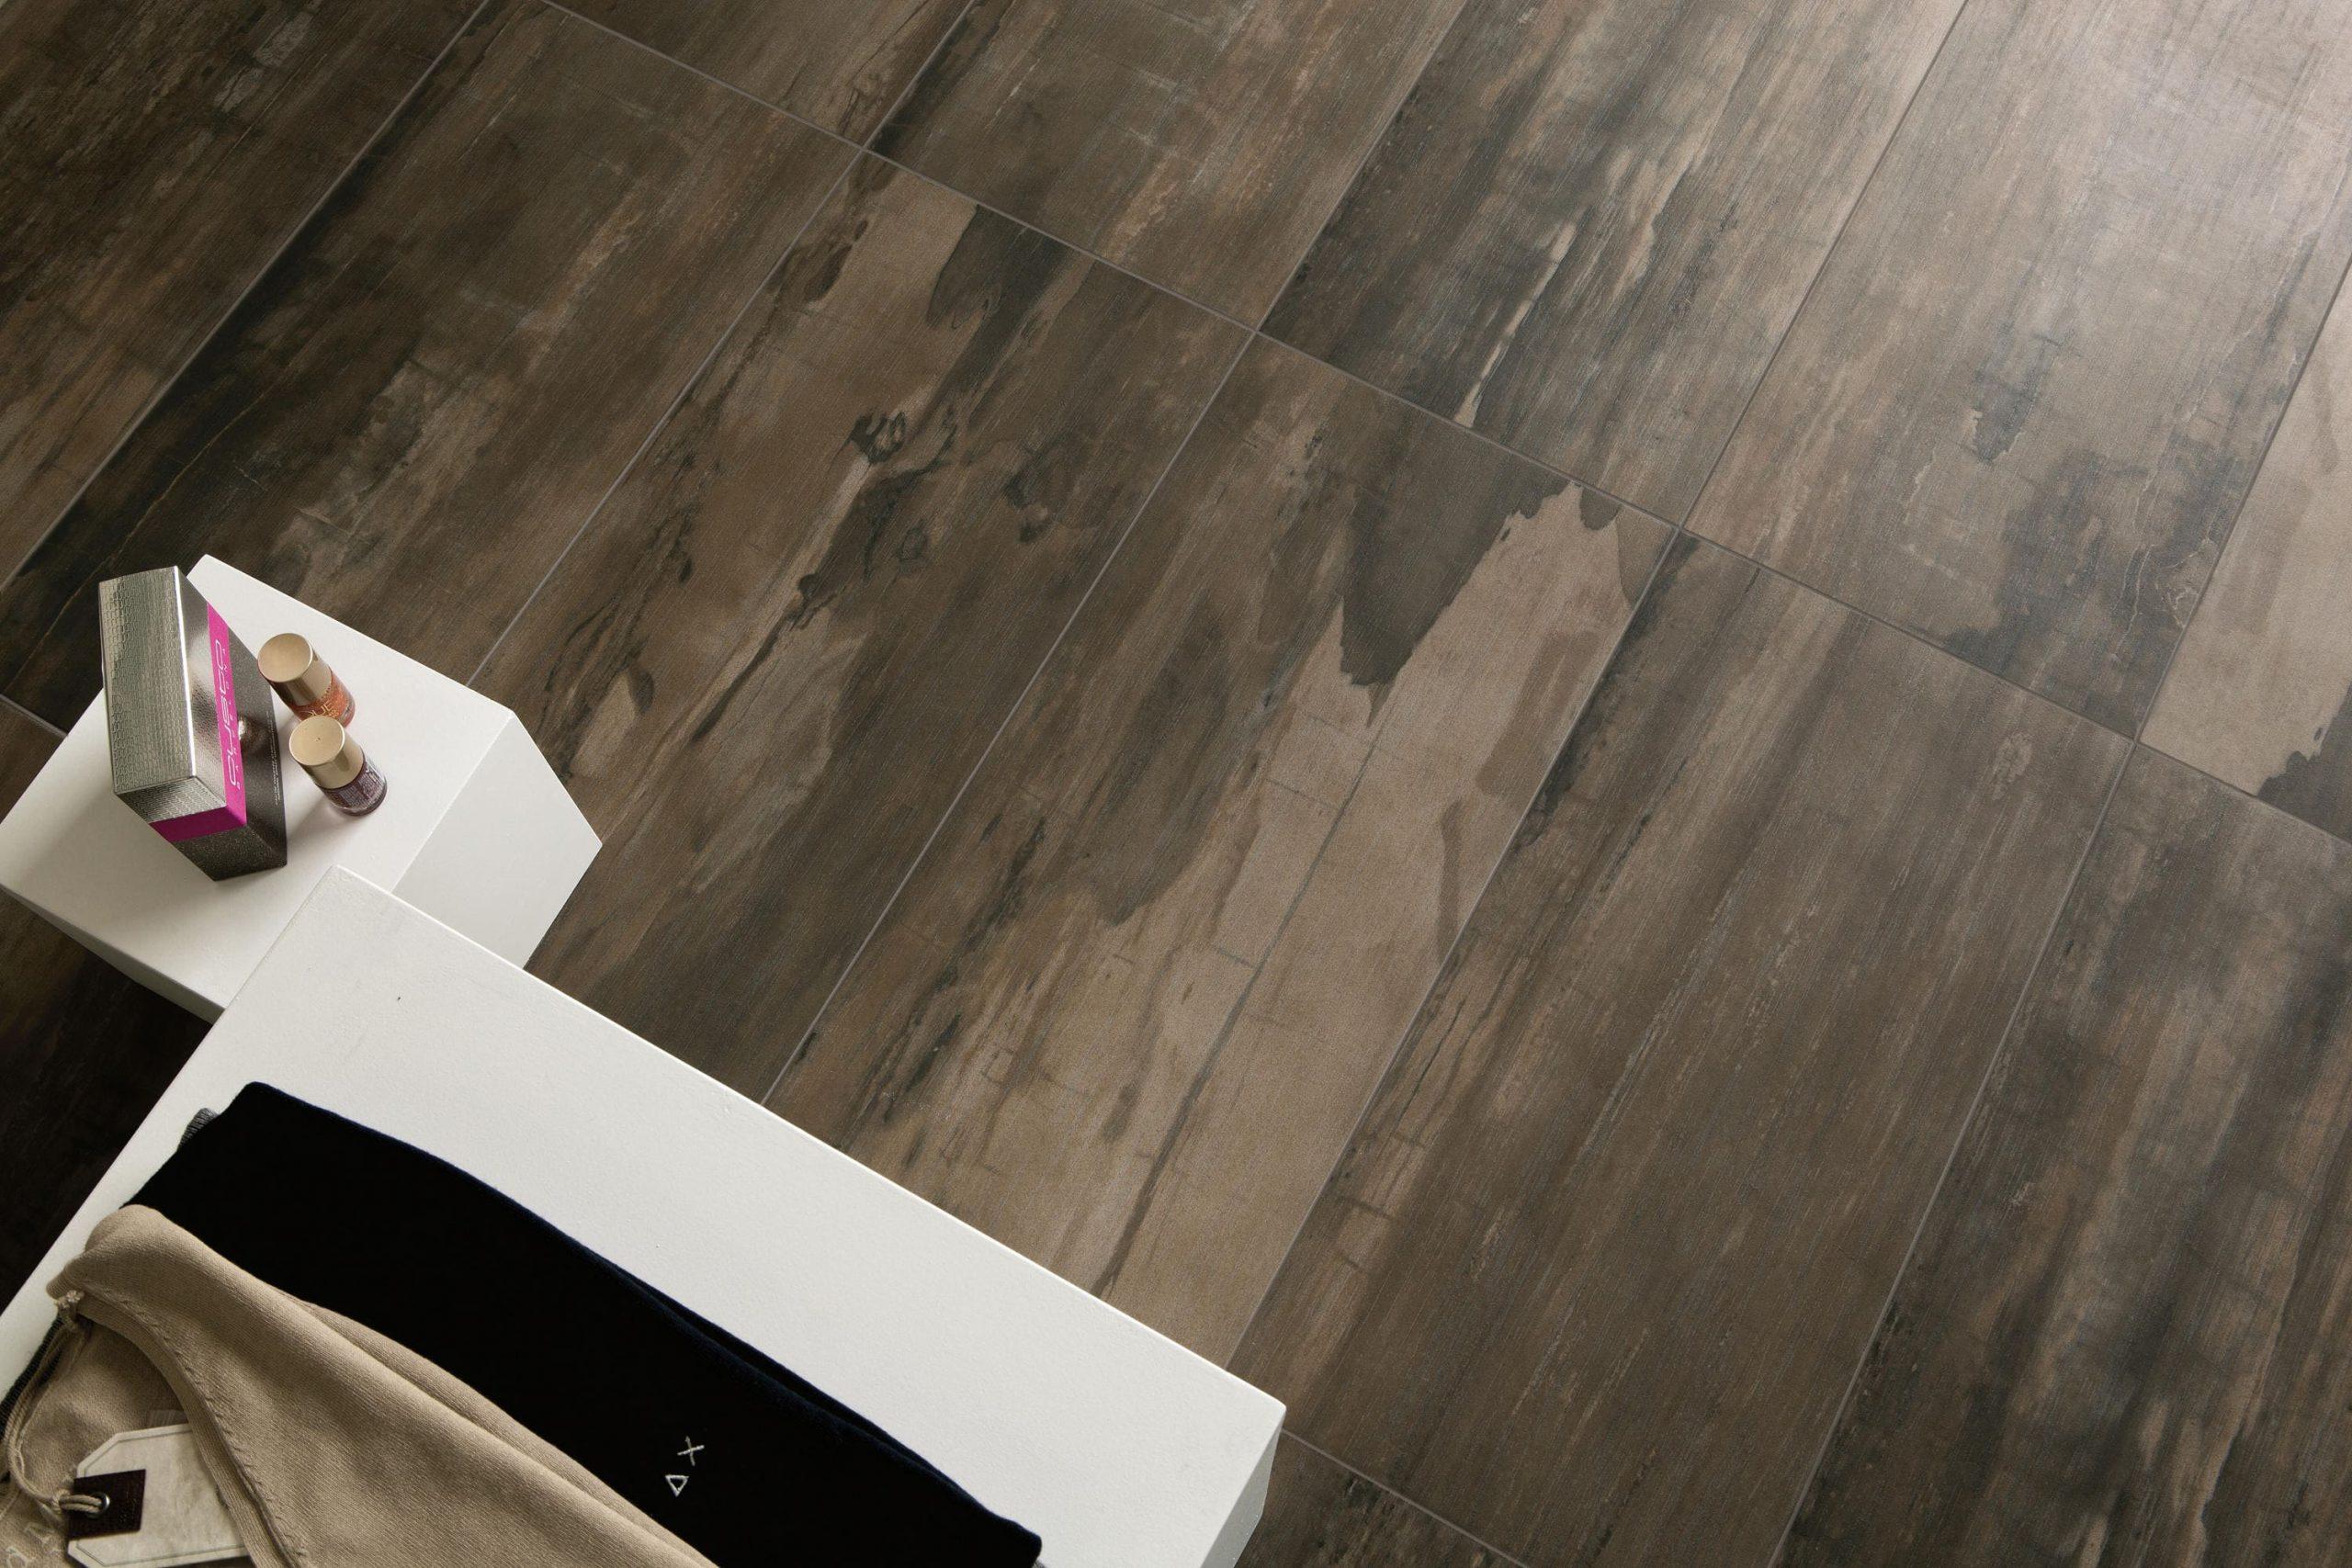 petrified-wood-brown-30x60-€-9,50_Edilbricksrl_Fiuggi